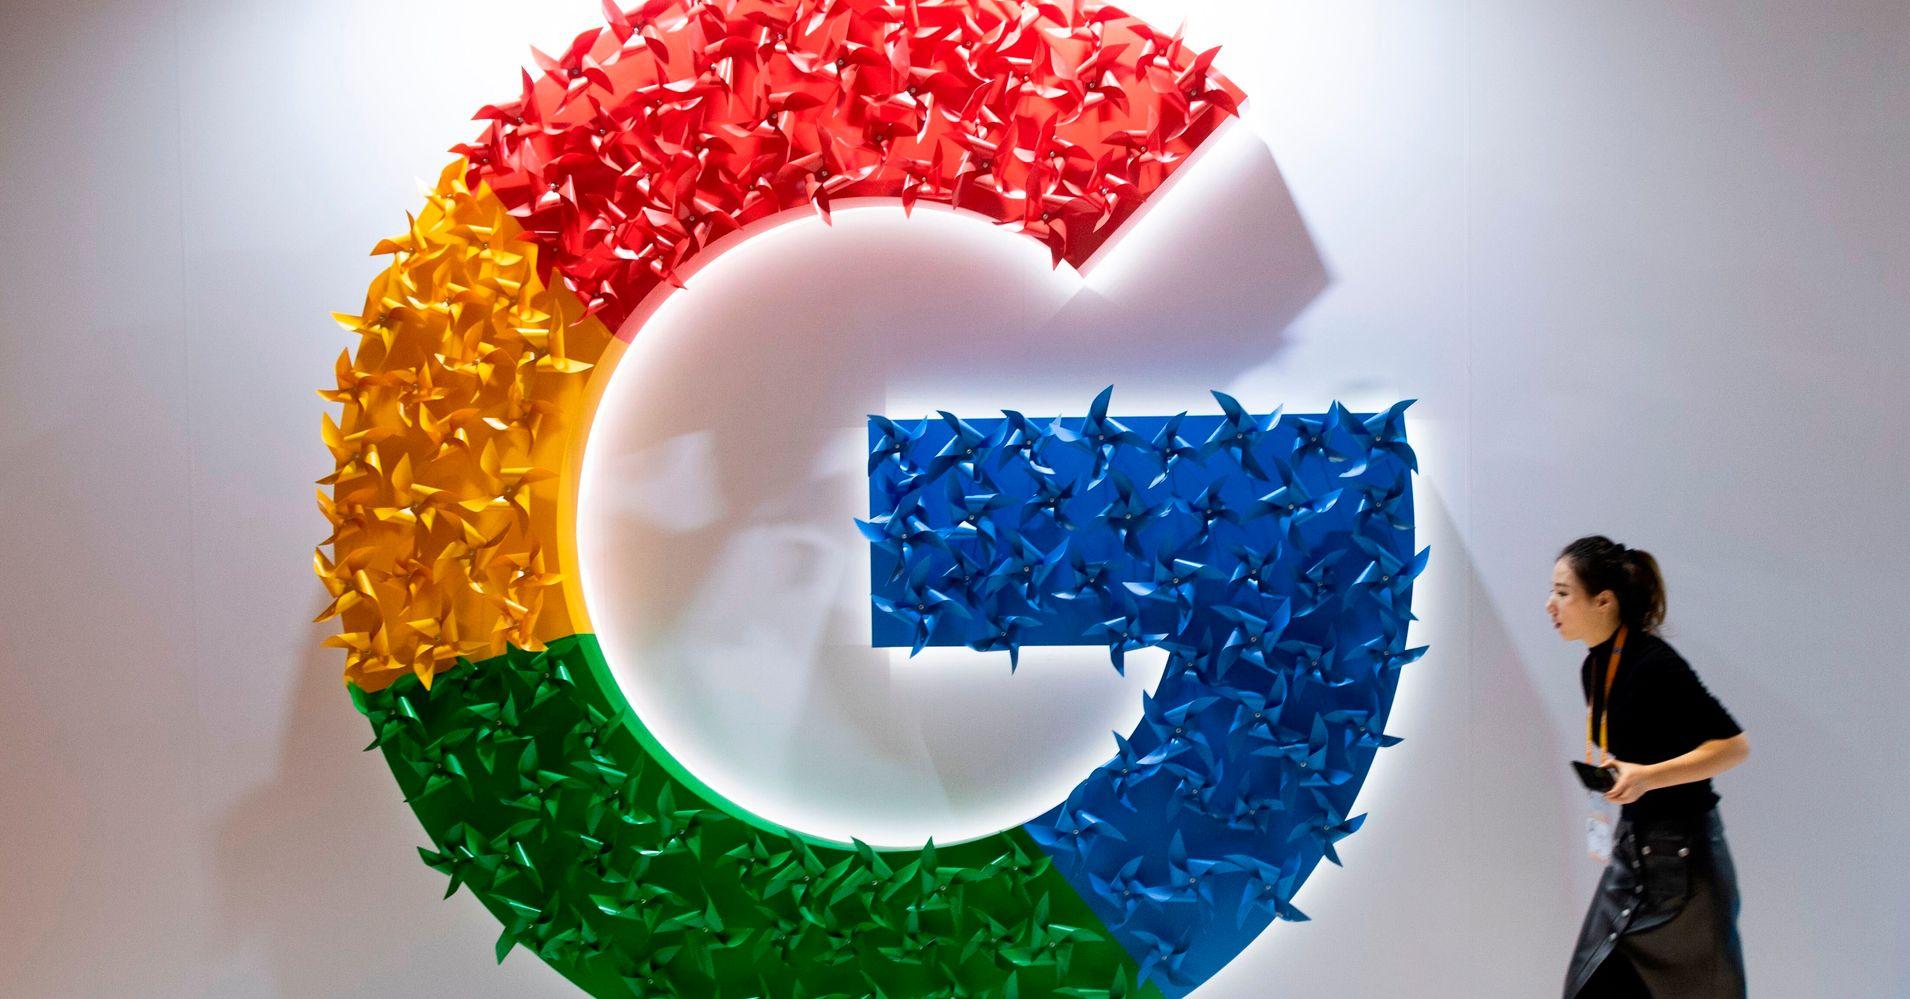 Westlake Legal Group 5cf28d552100005400e687fb DOJ Preparing Google Antitrust Probe, Sources Say